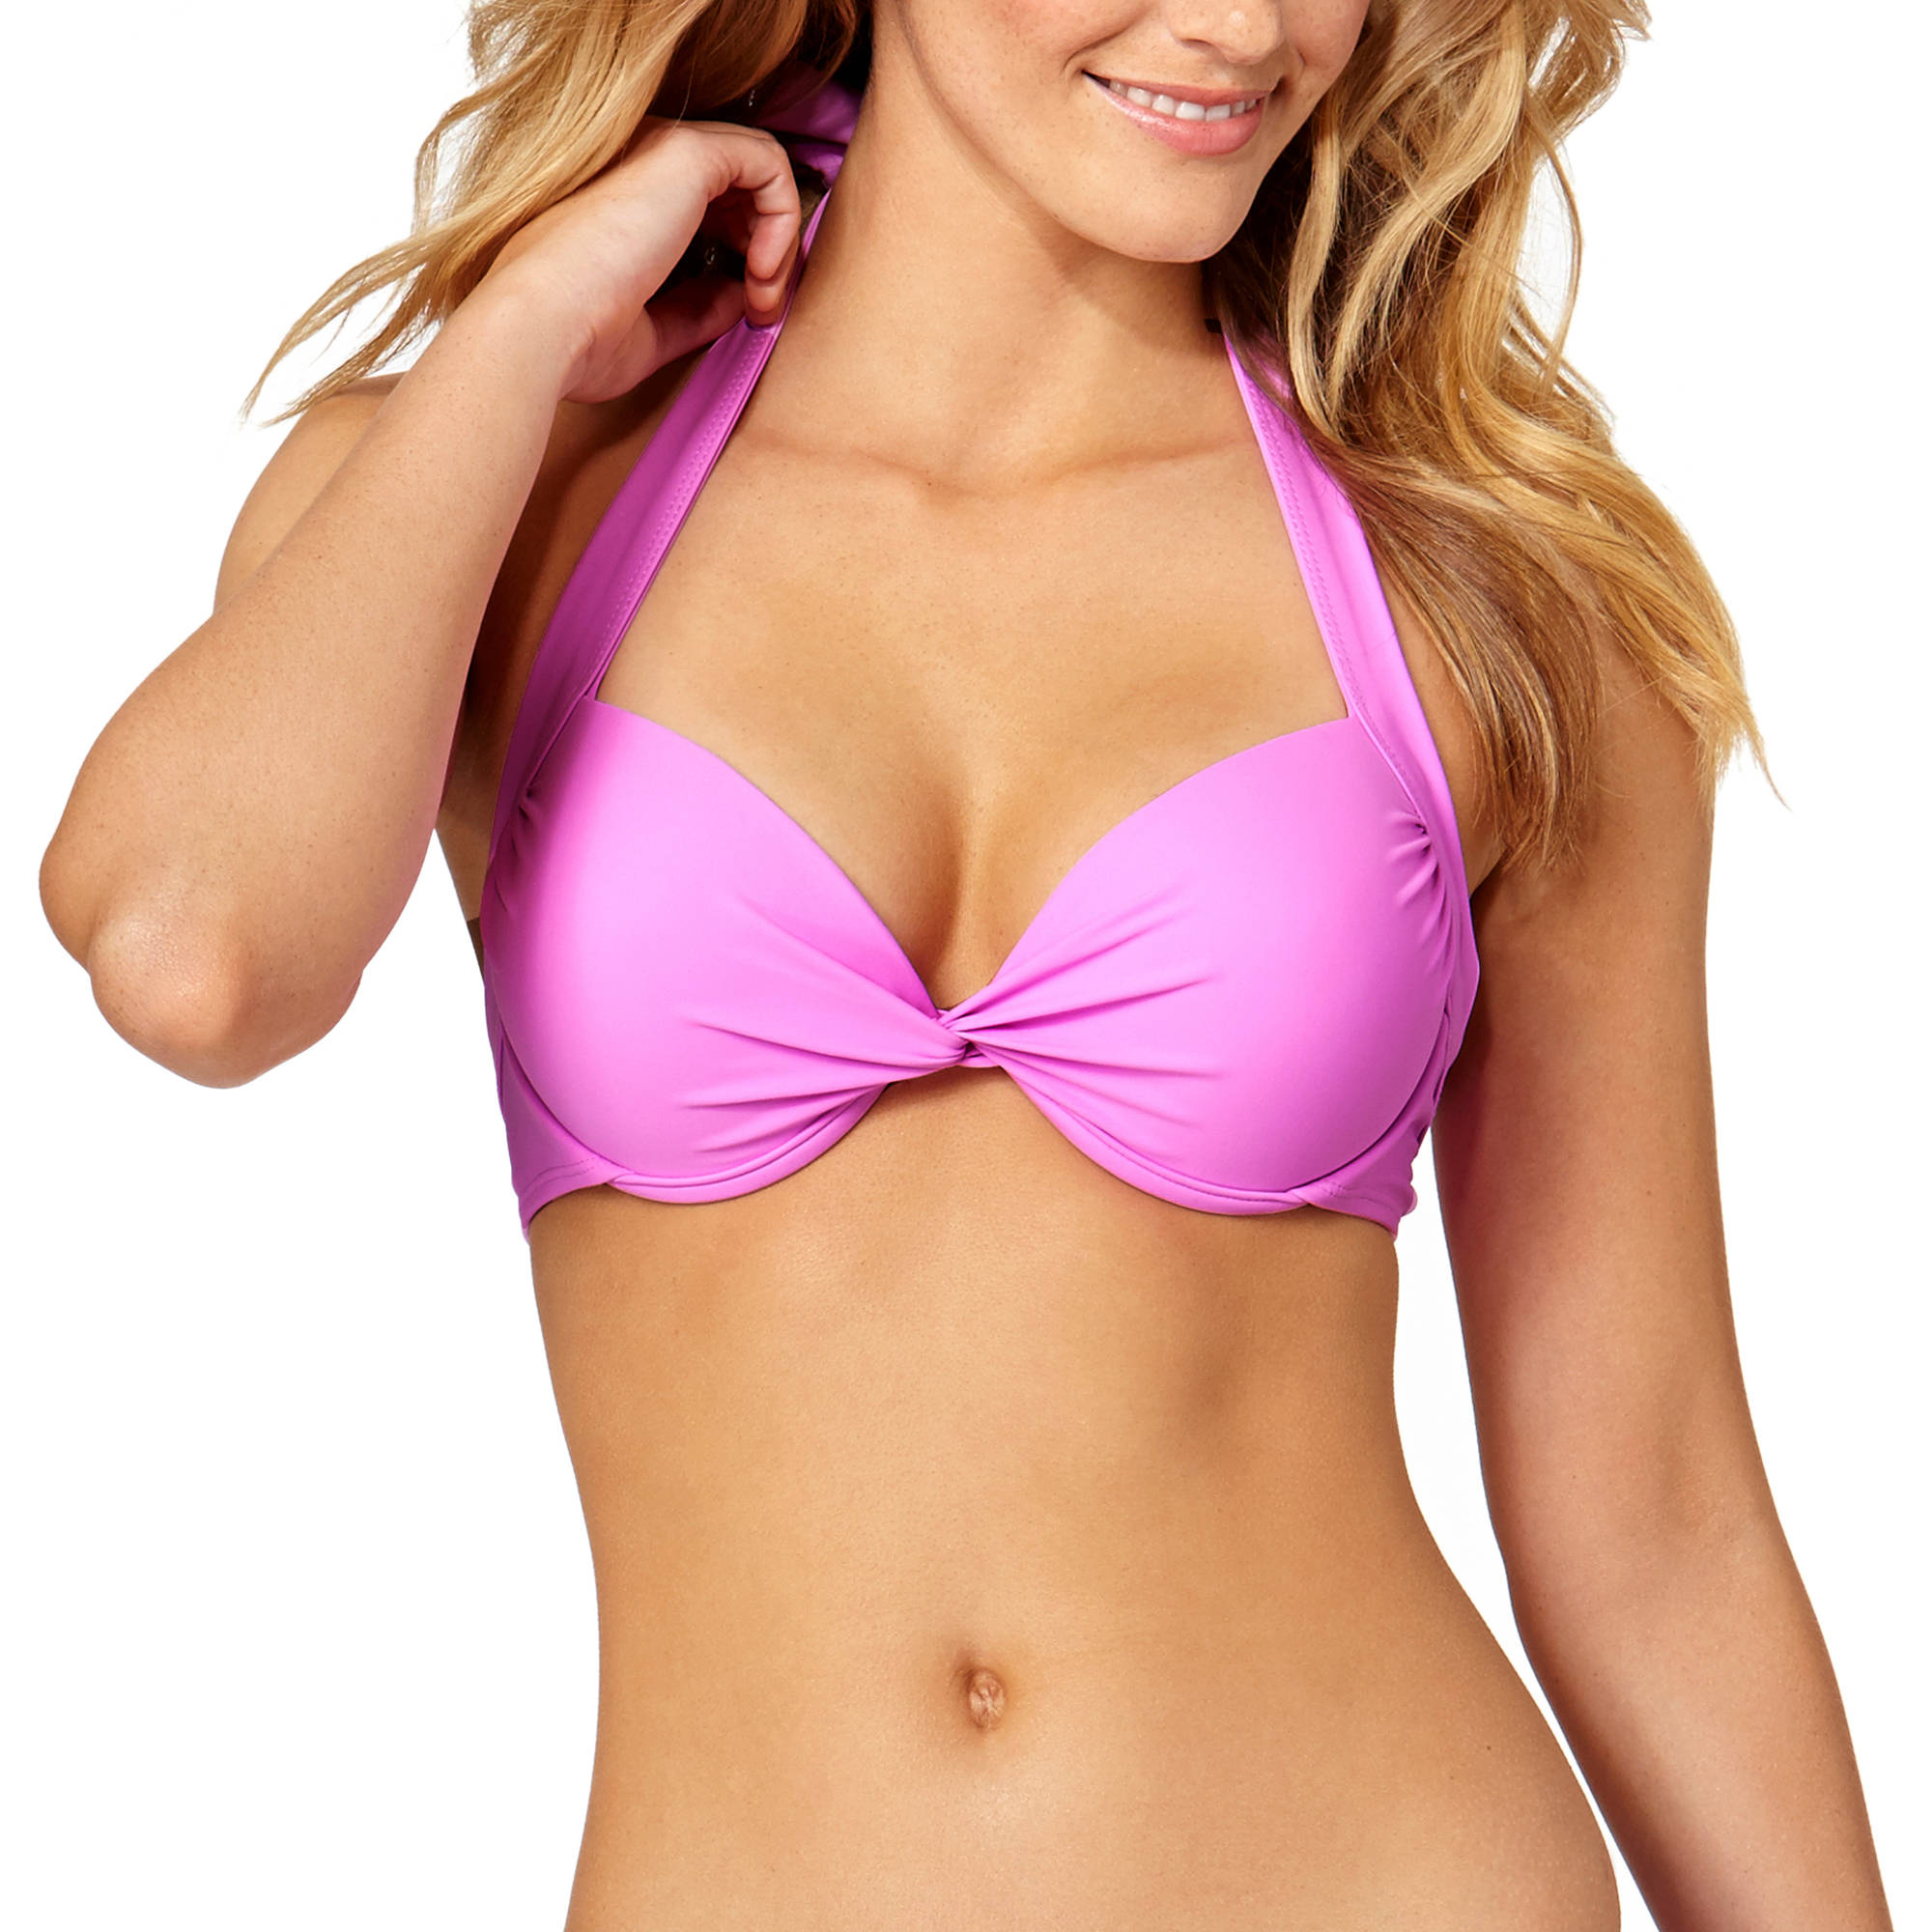 Tahiti Women's Lavender Push Up Bikini Top